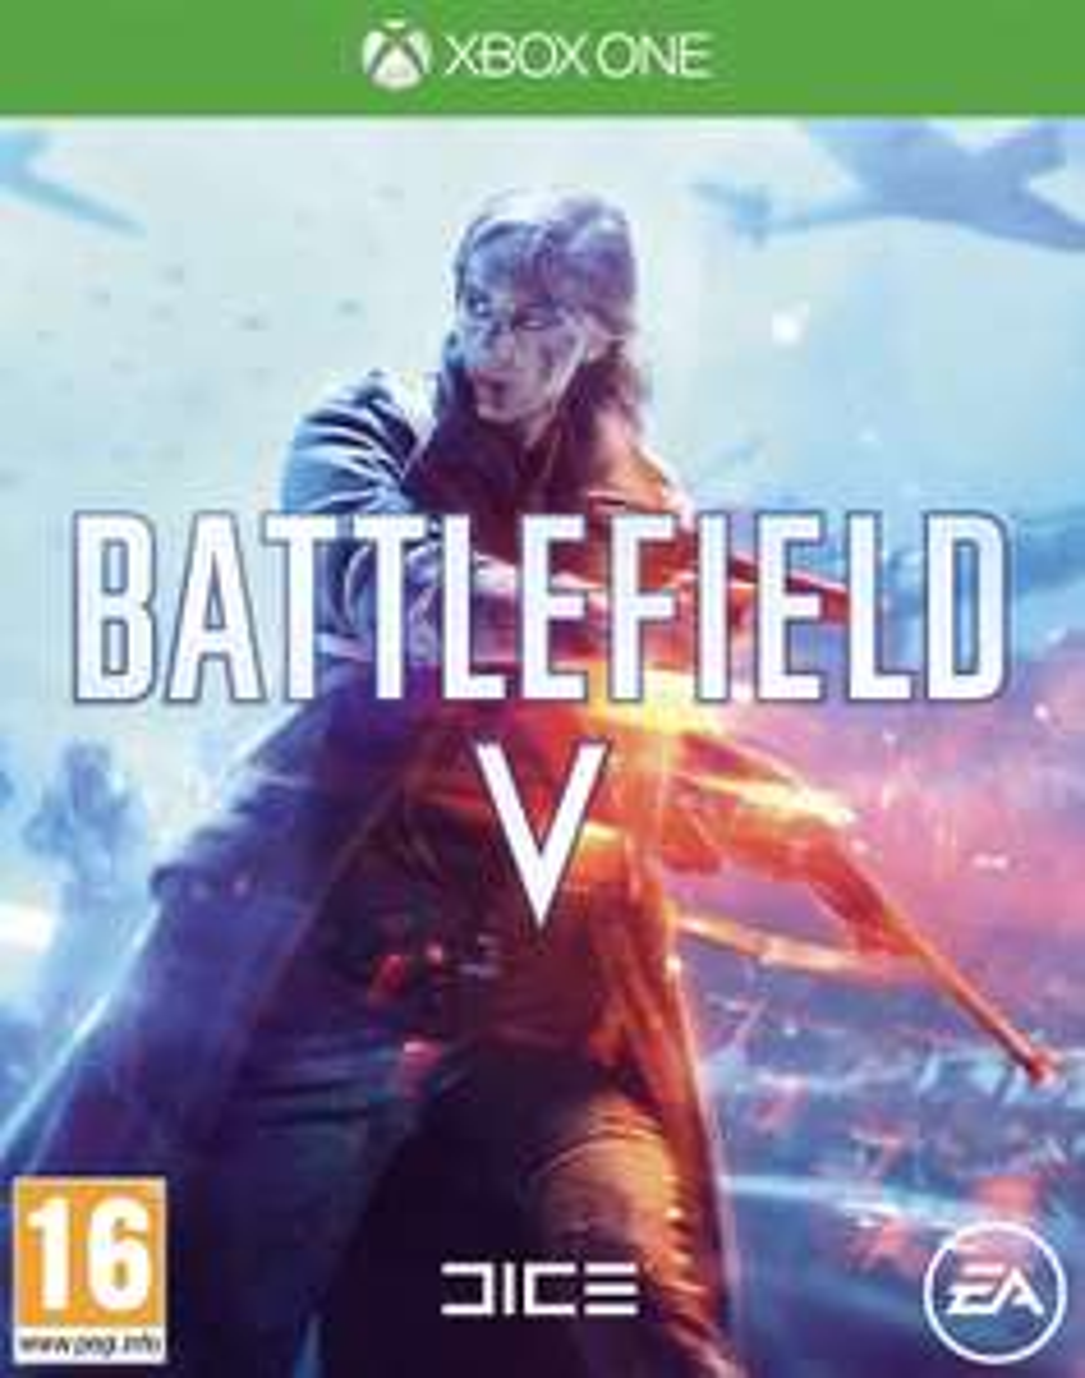 Battlefield V + DLC - Xbox One - £35.42 Delivered @ eBay (Boss_Deals)